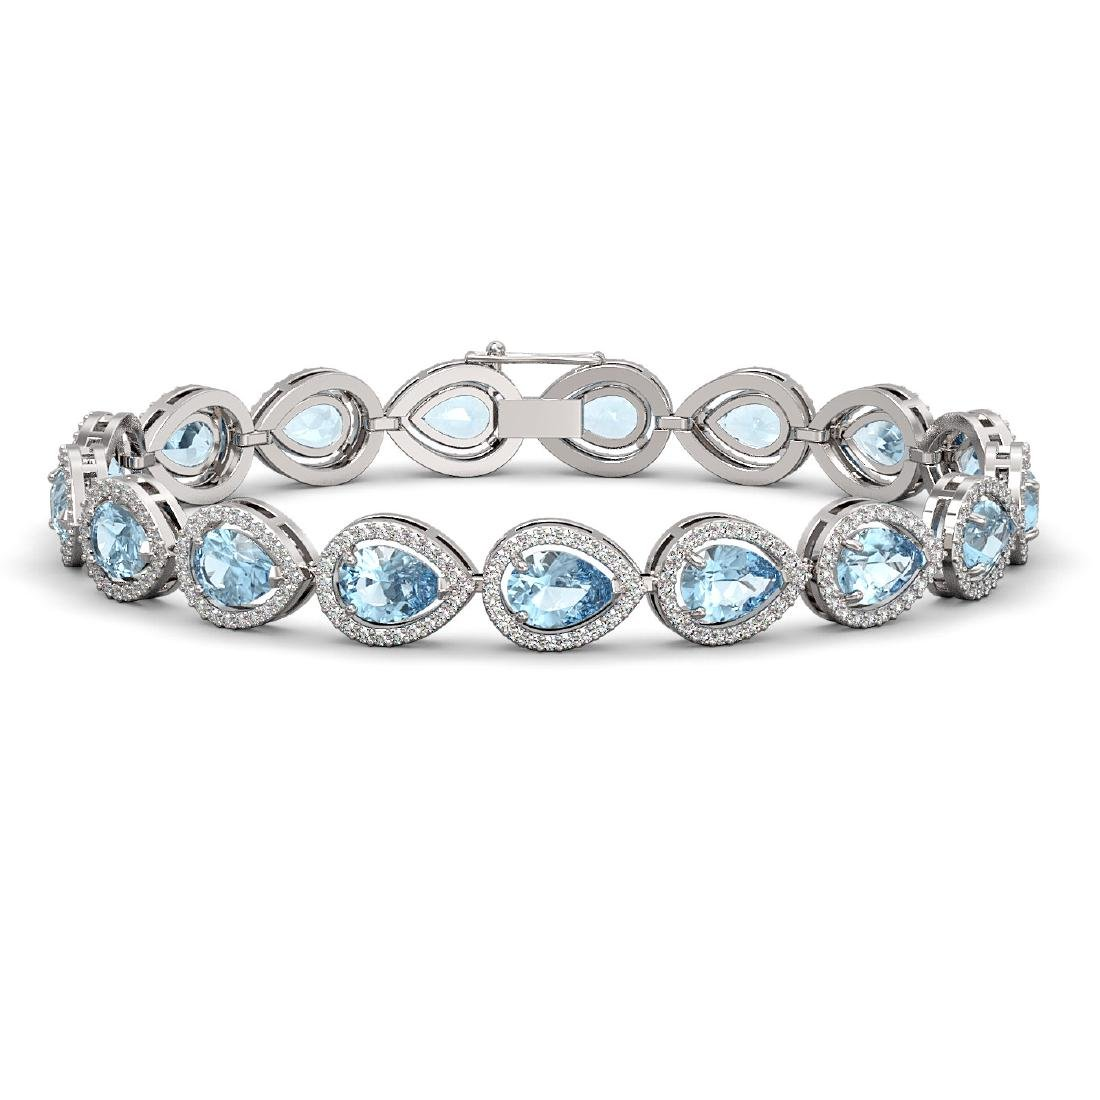 15.74 CTW Aquamarine & Diamond Halo Bracelet 10K White